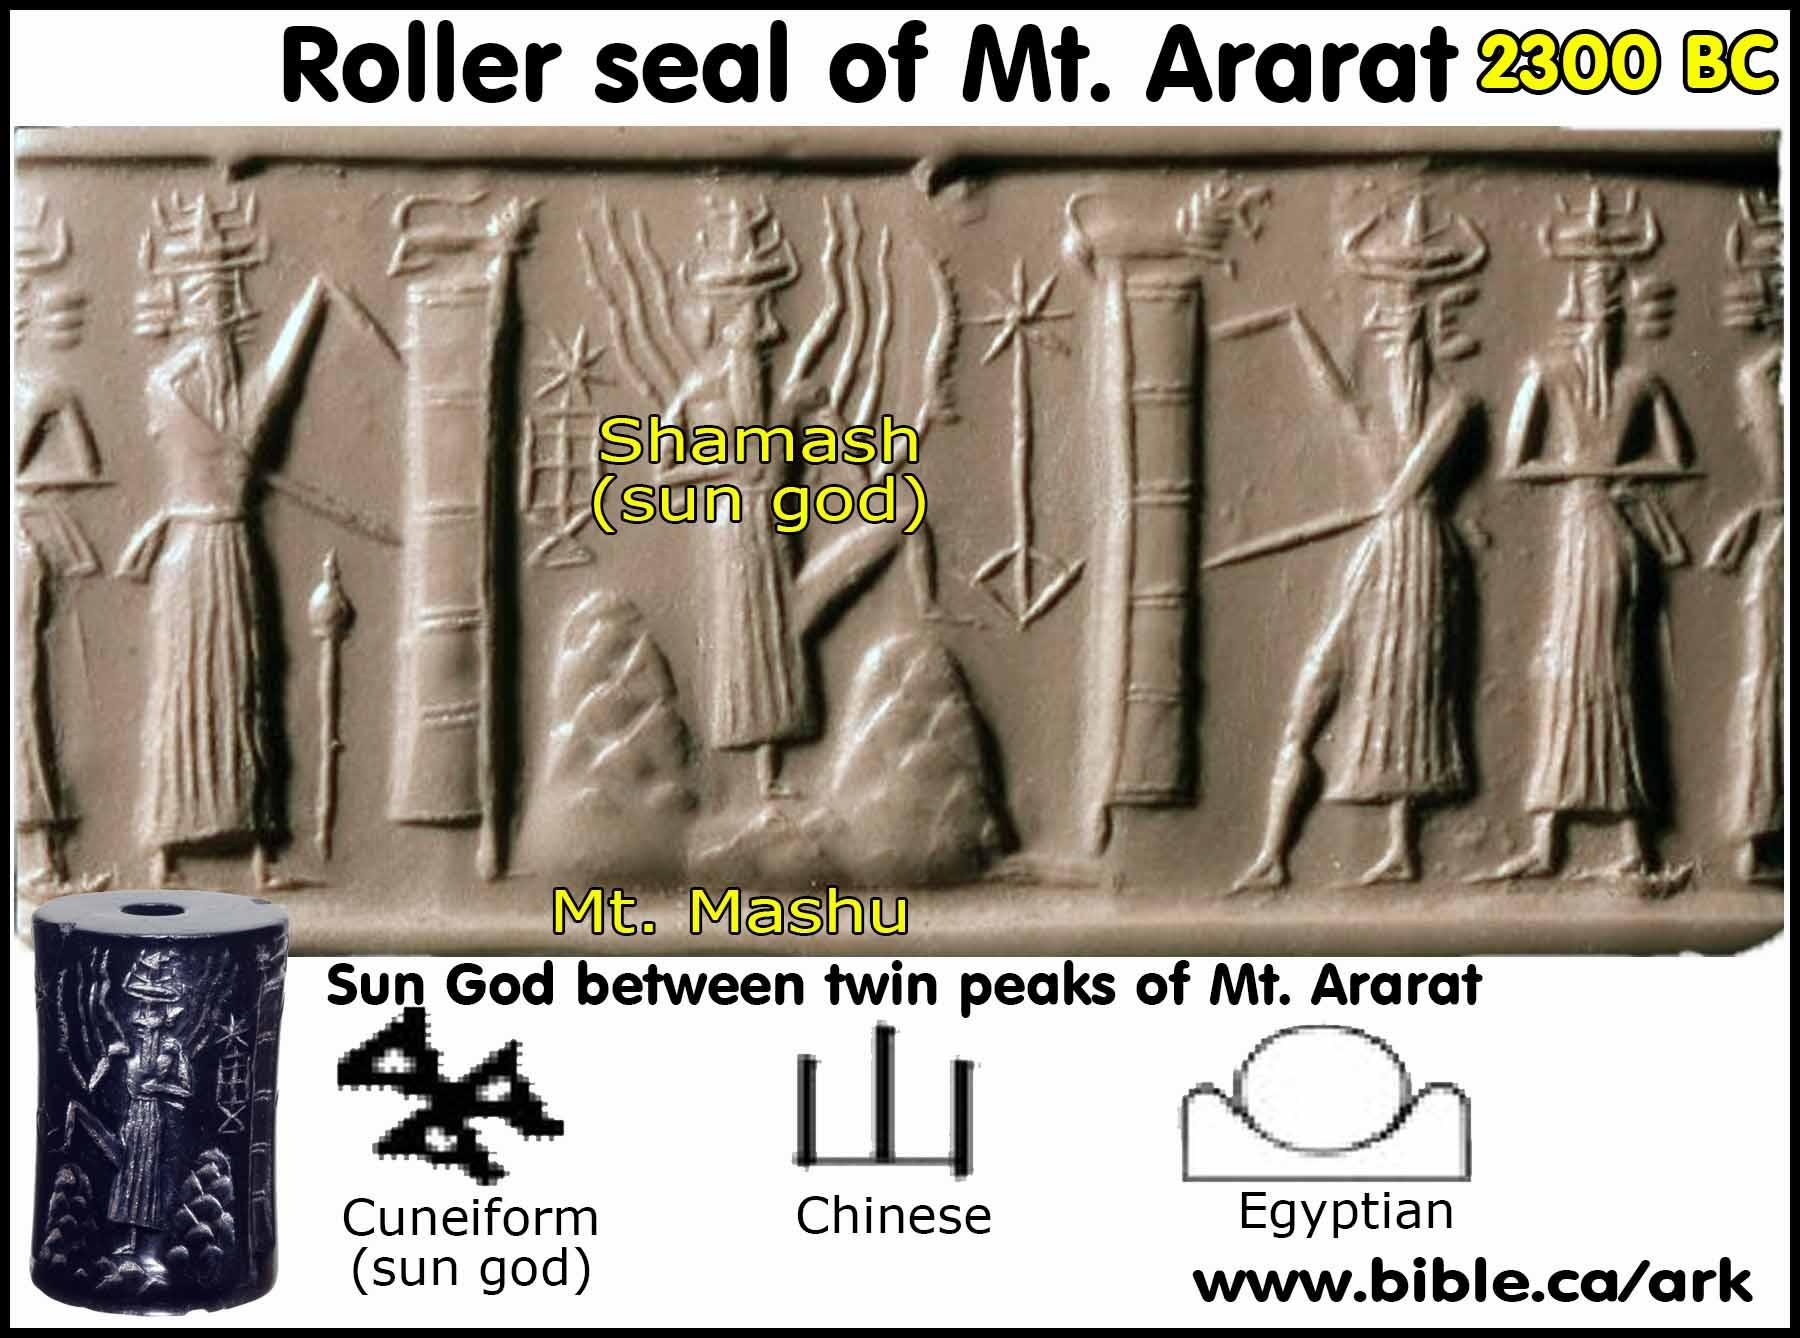 The Epic of Gilgamesh 1150 BC: 500 Flood stories prove